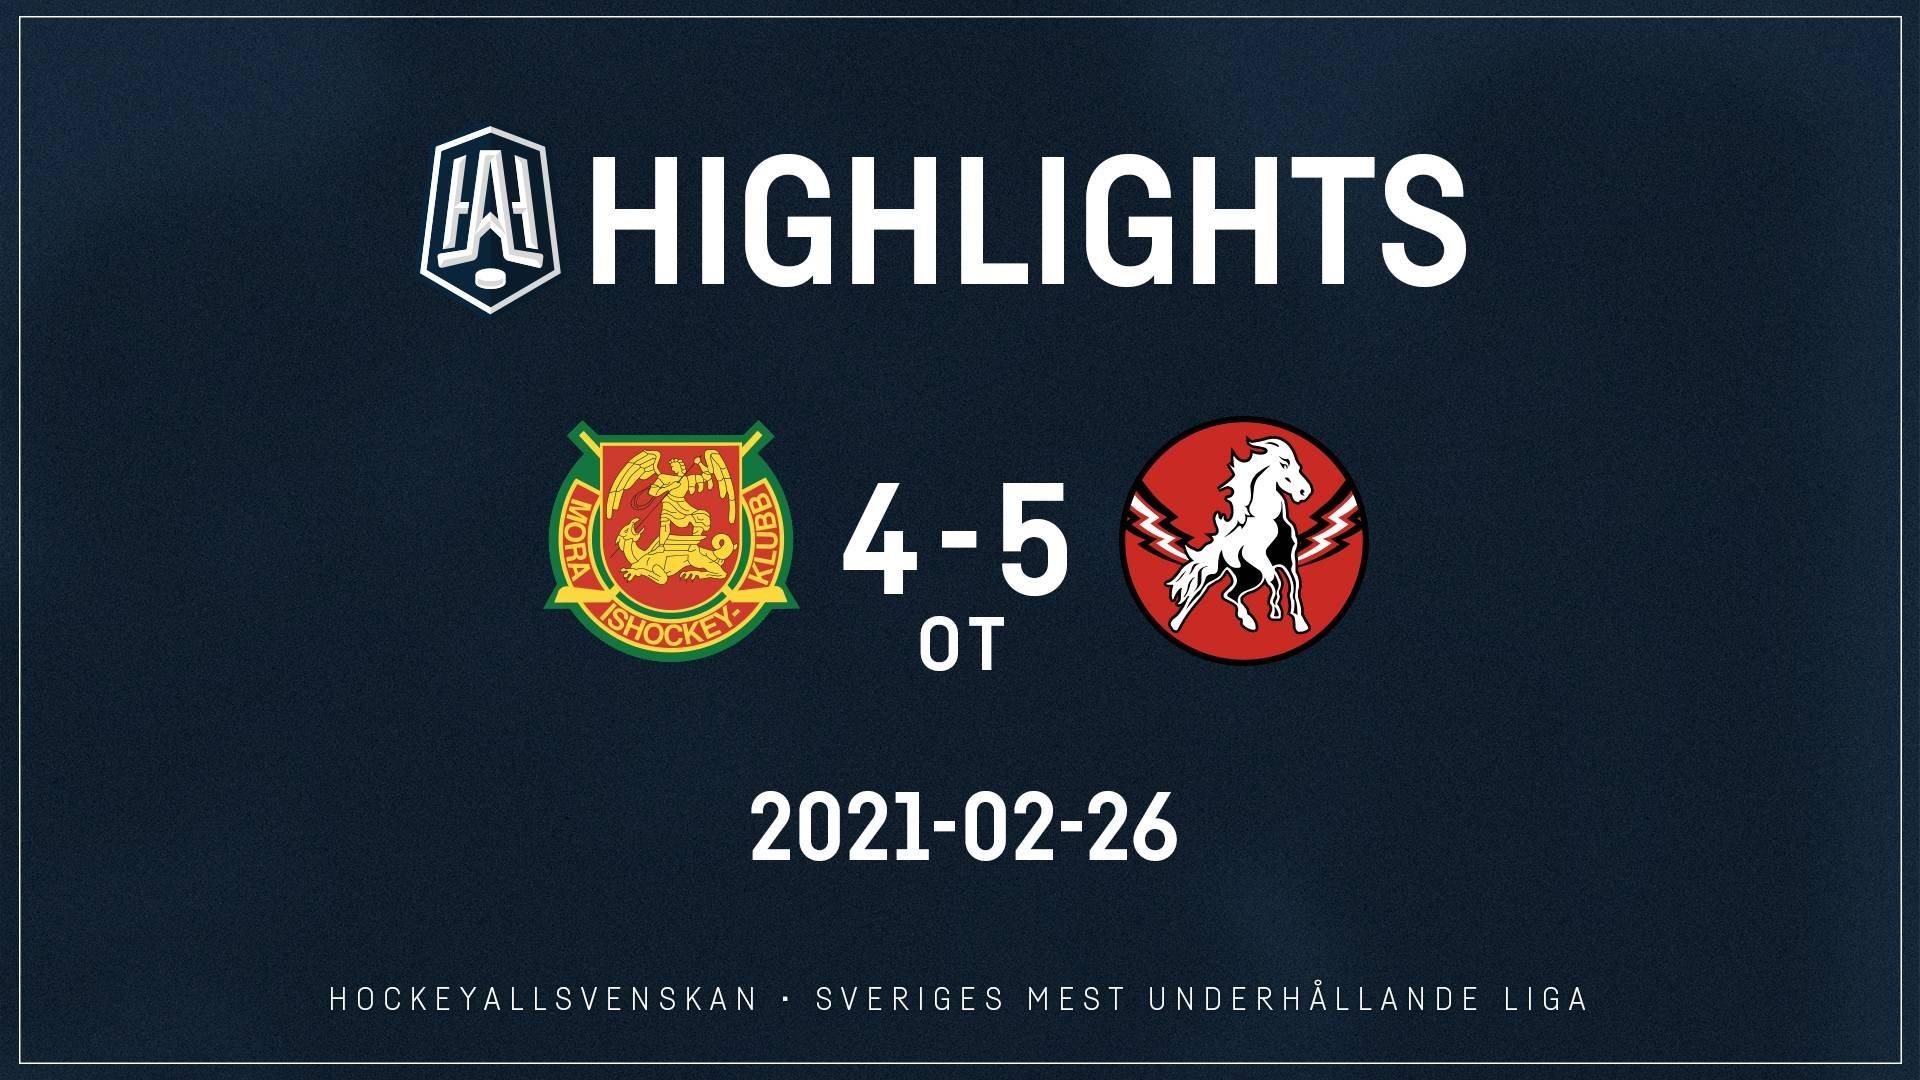 2021-02-26 Mora - Vita Hästen 4-5 (OT)